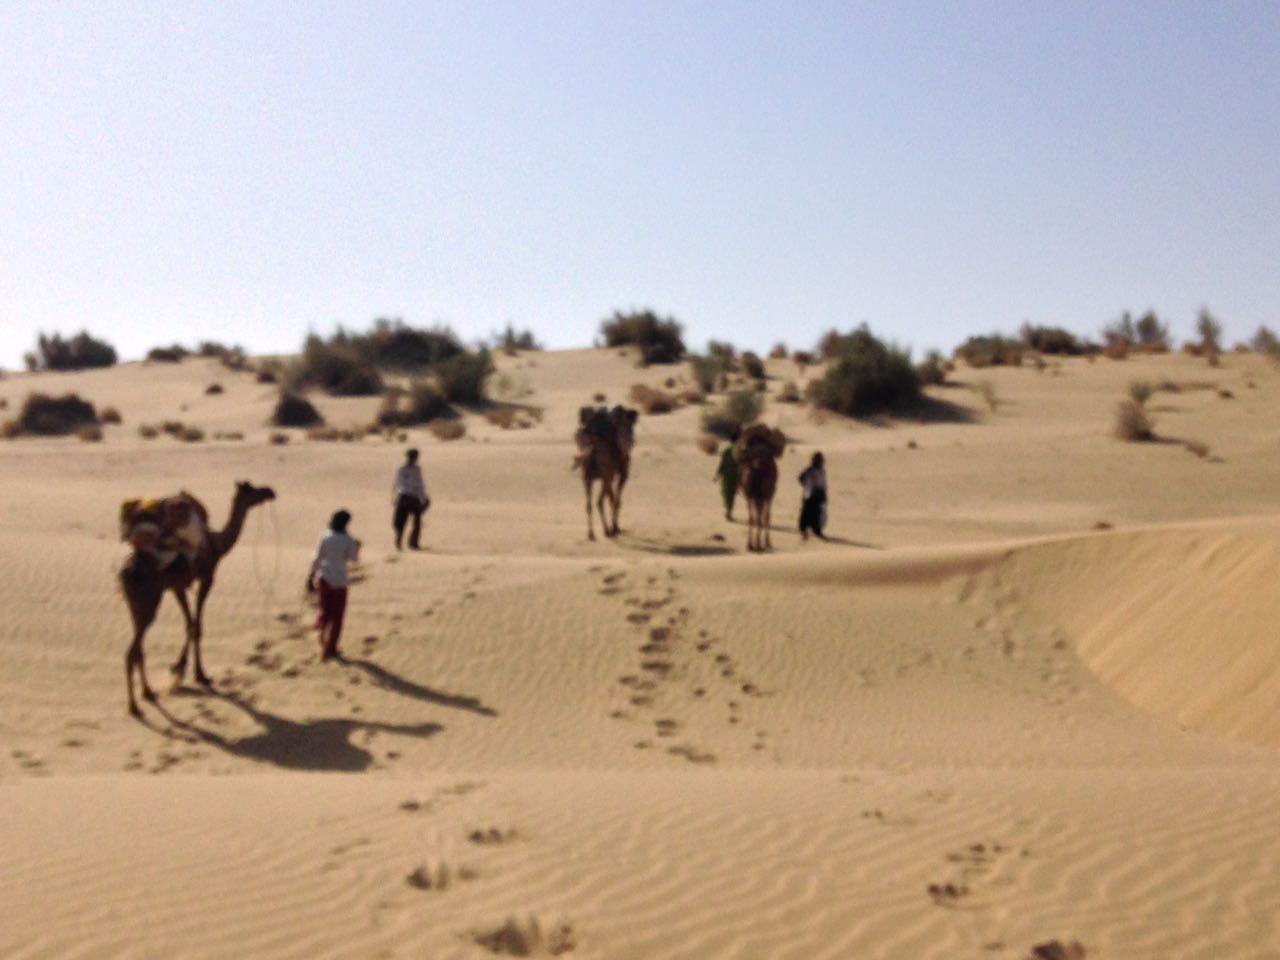 Crazy Camel Guest House